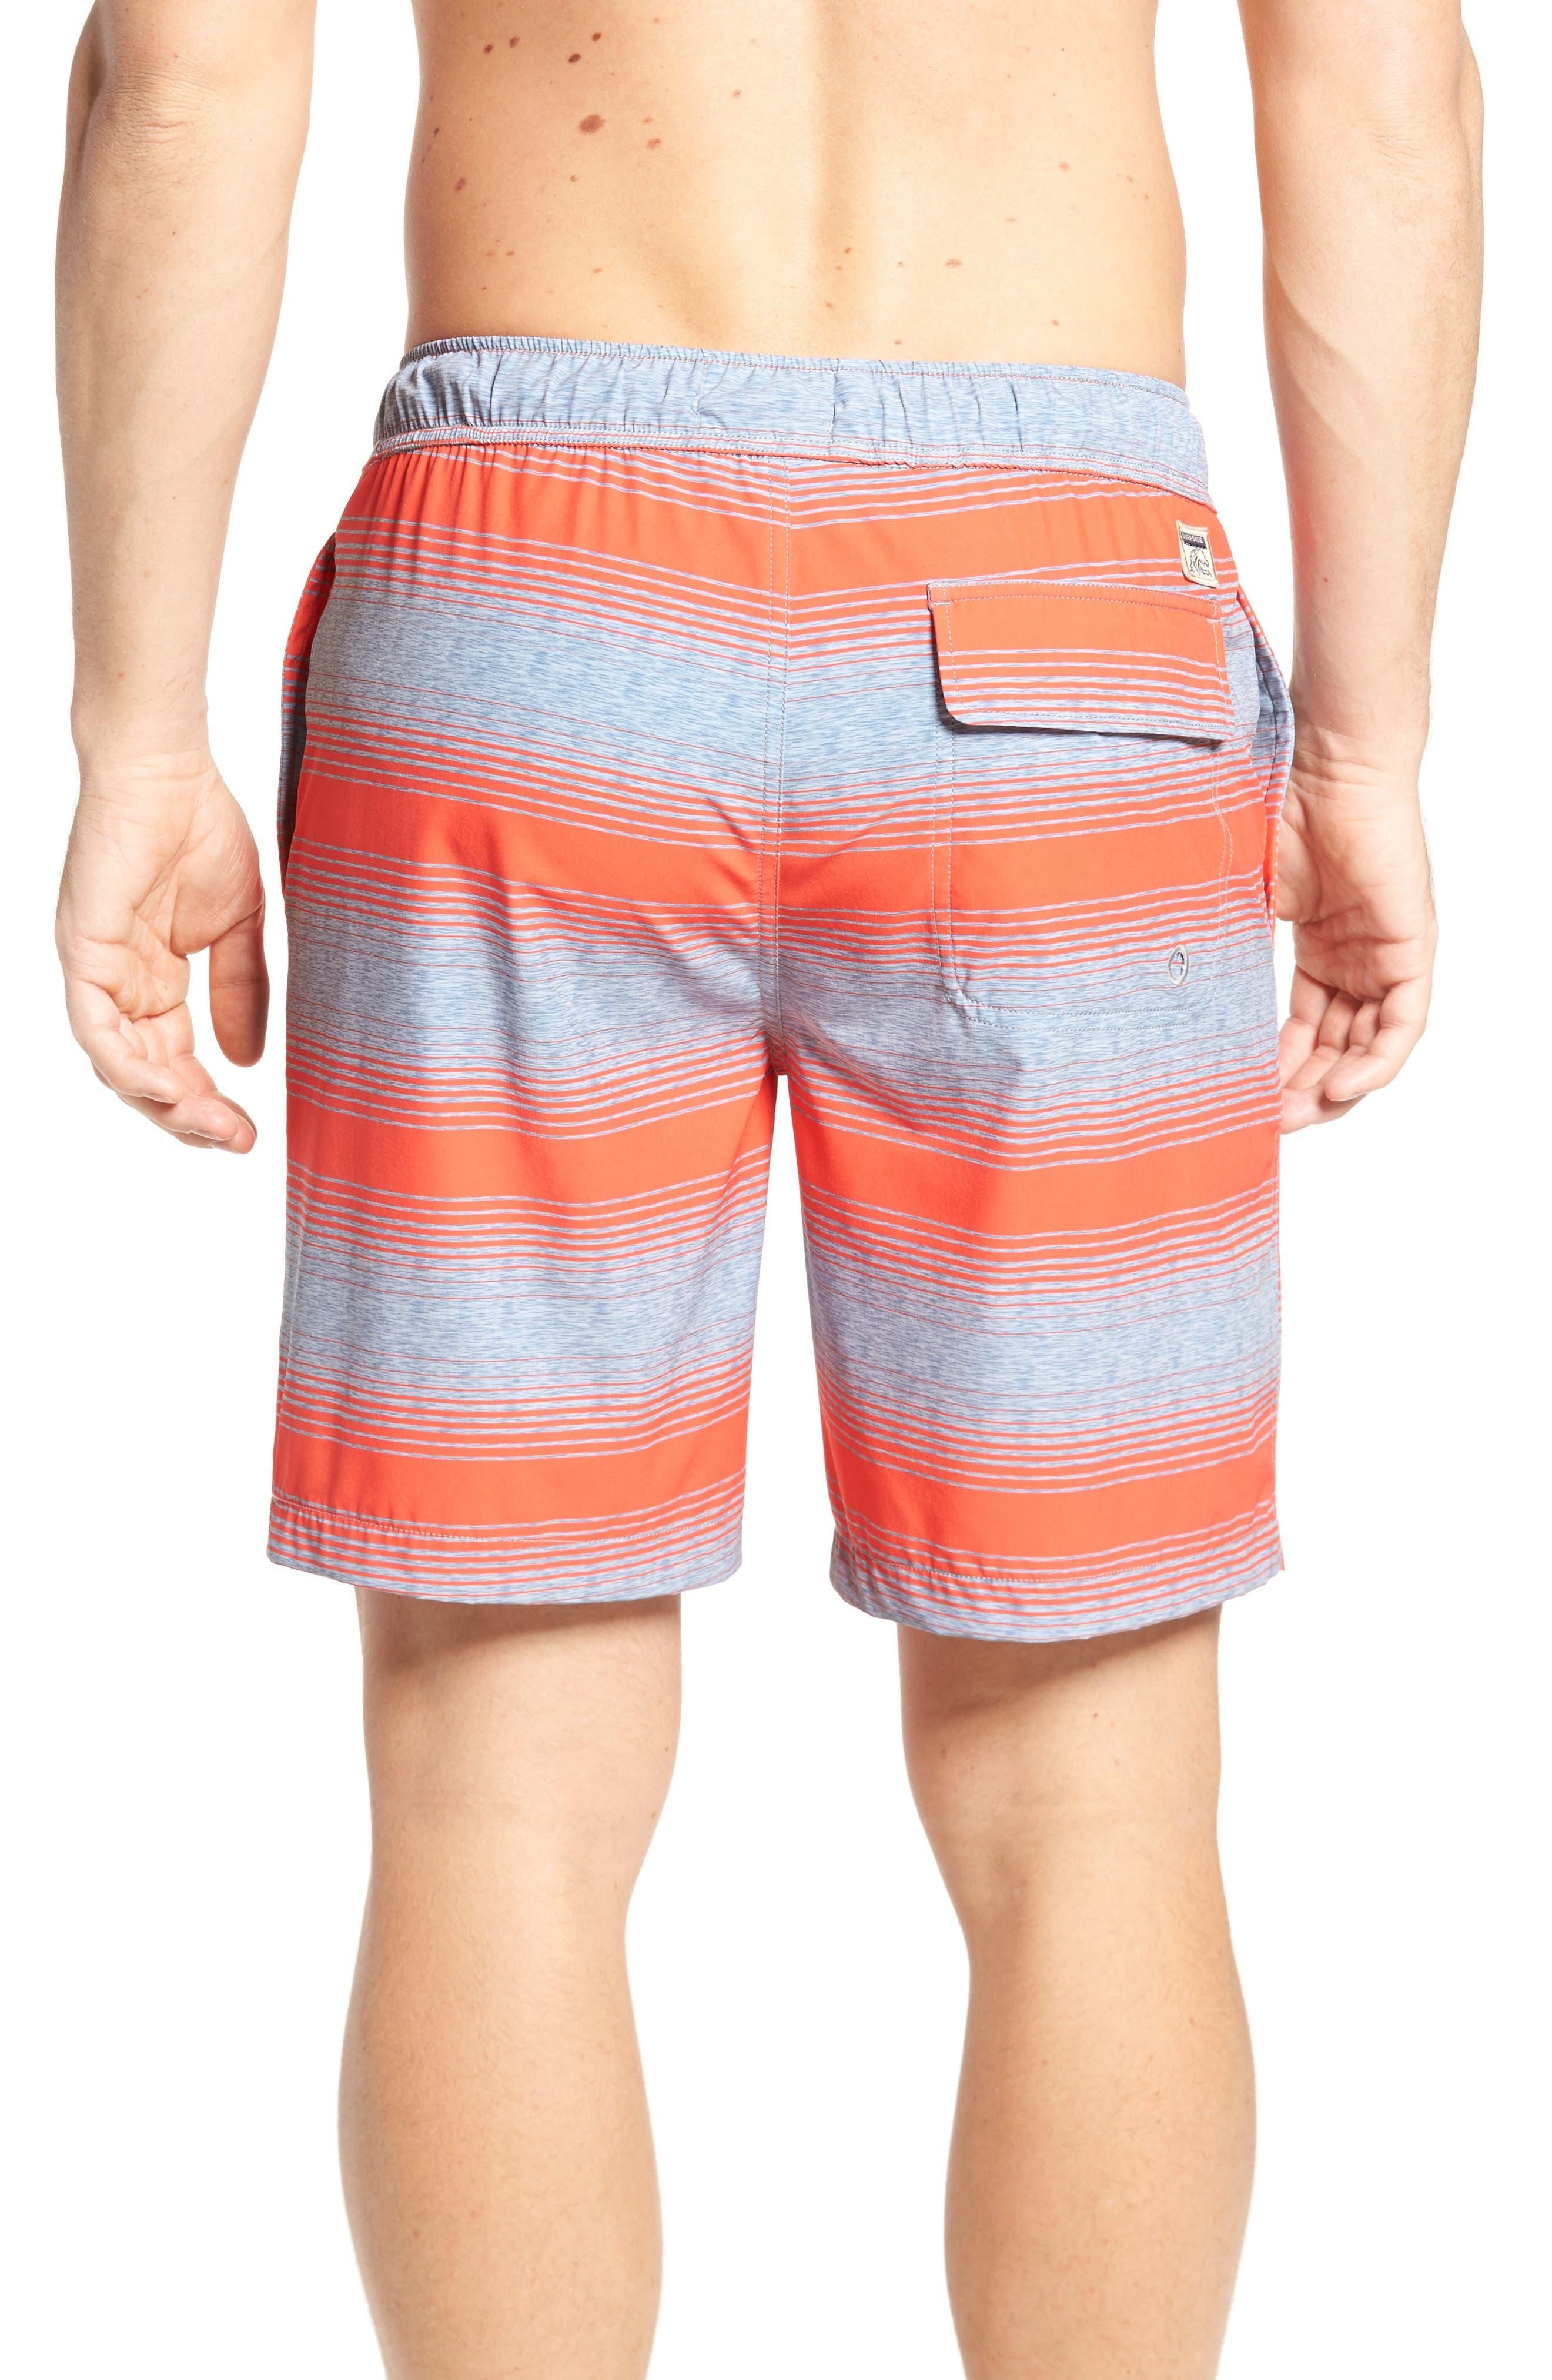 Stripe Swim Trunks,                             Alternate thumbnail 2, color,                             Hot Coral